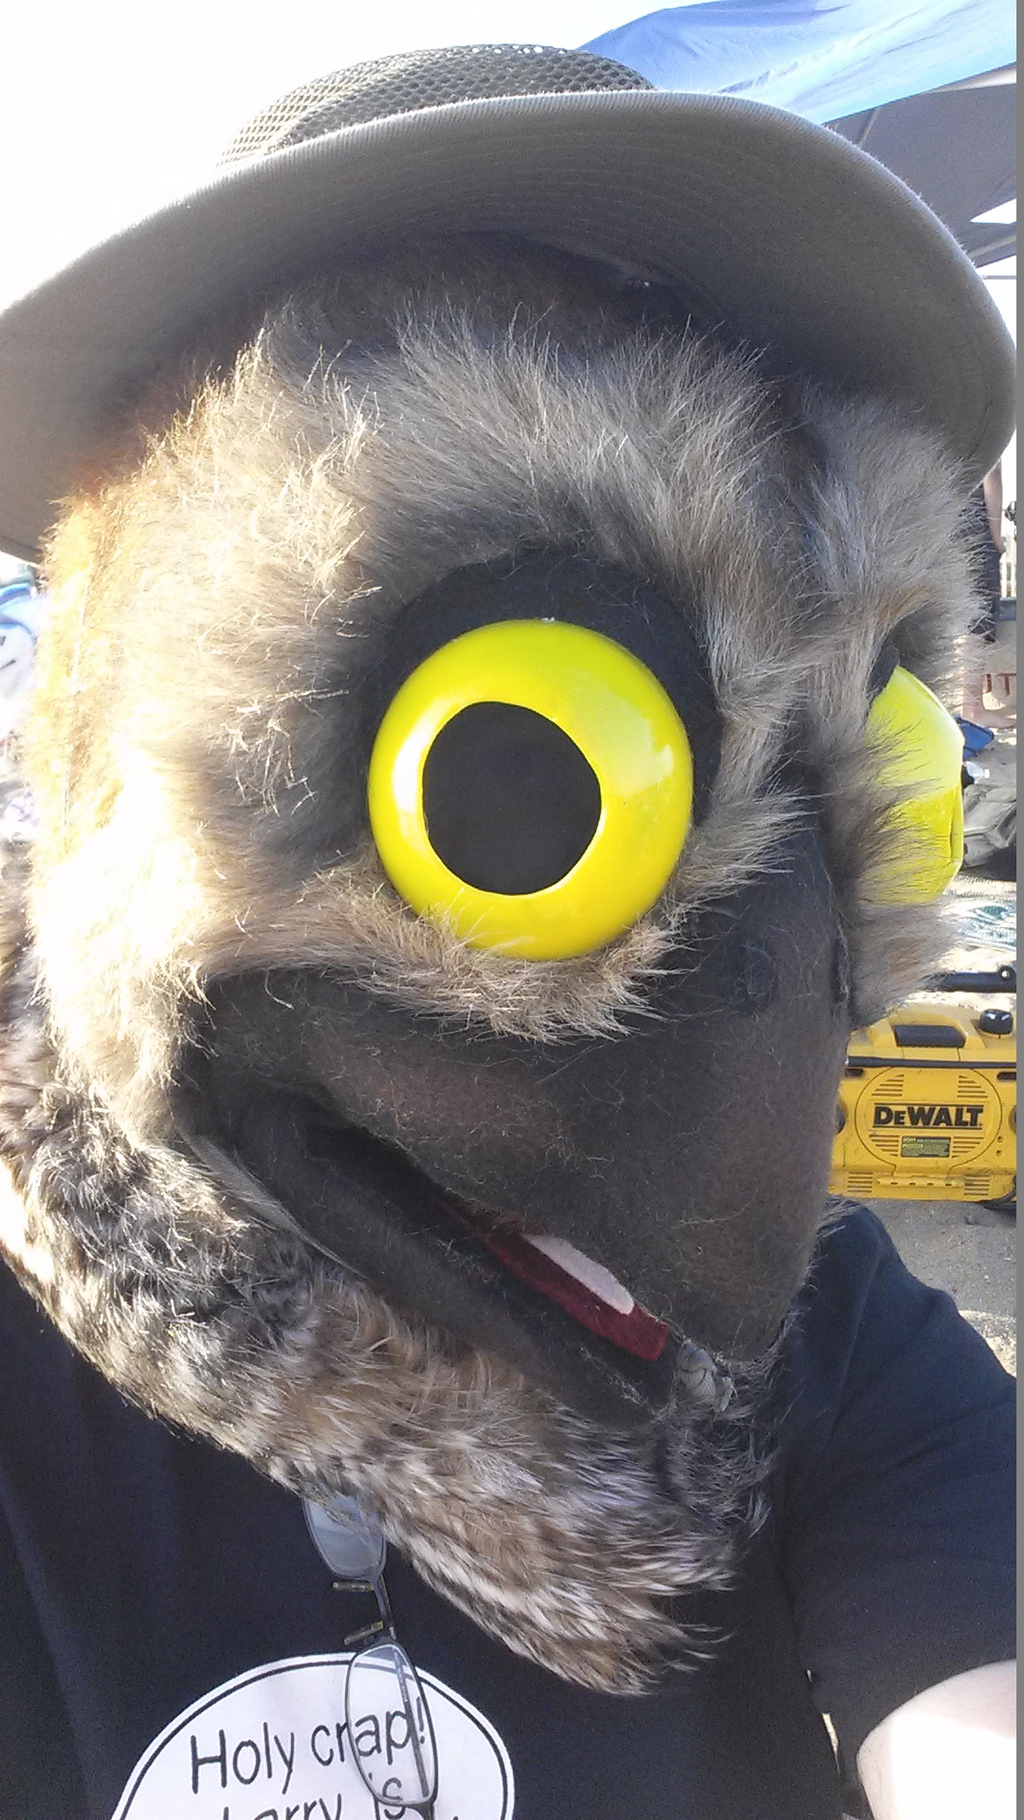 Most recent image: I suck at selfies